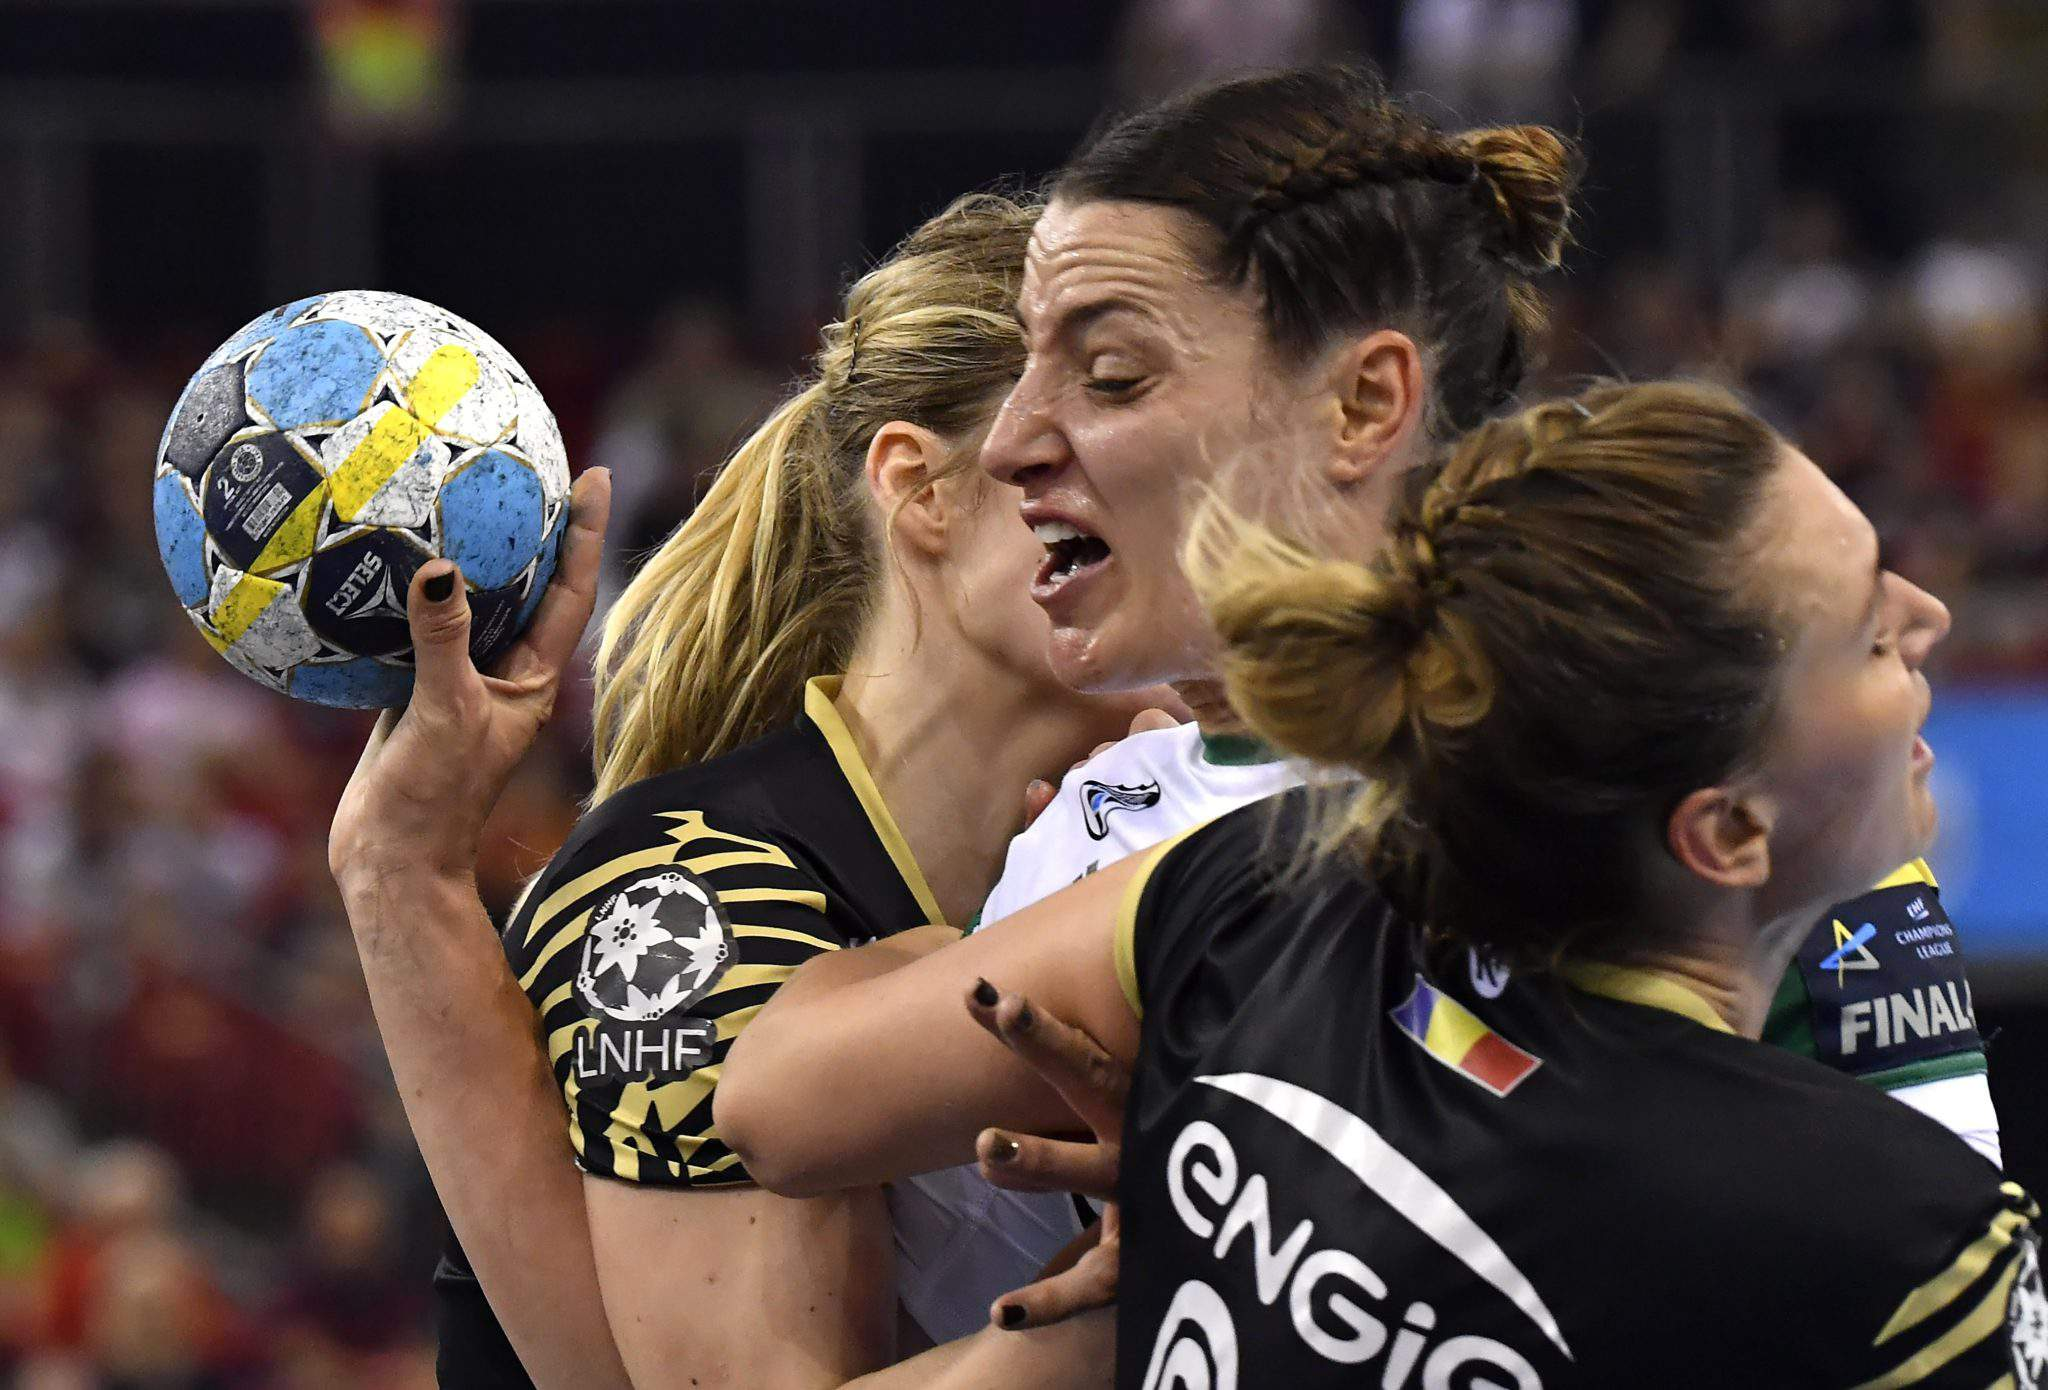 Handball Győr